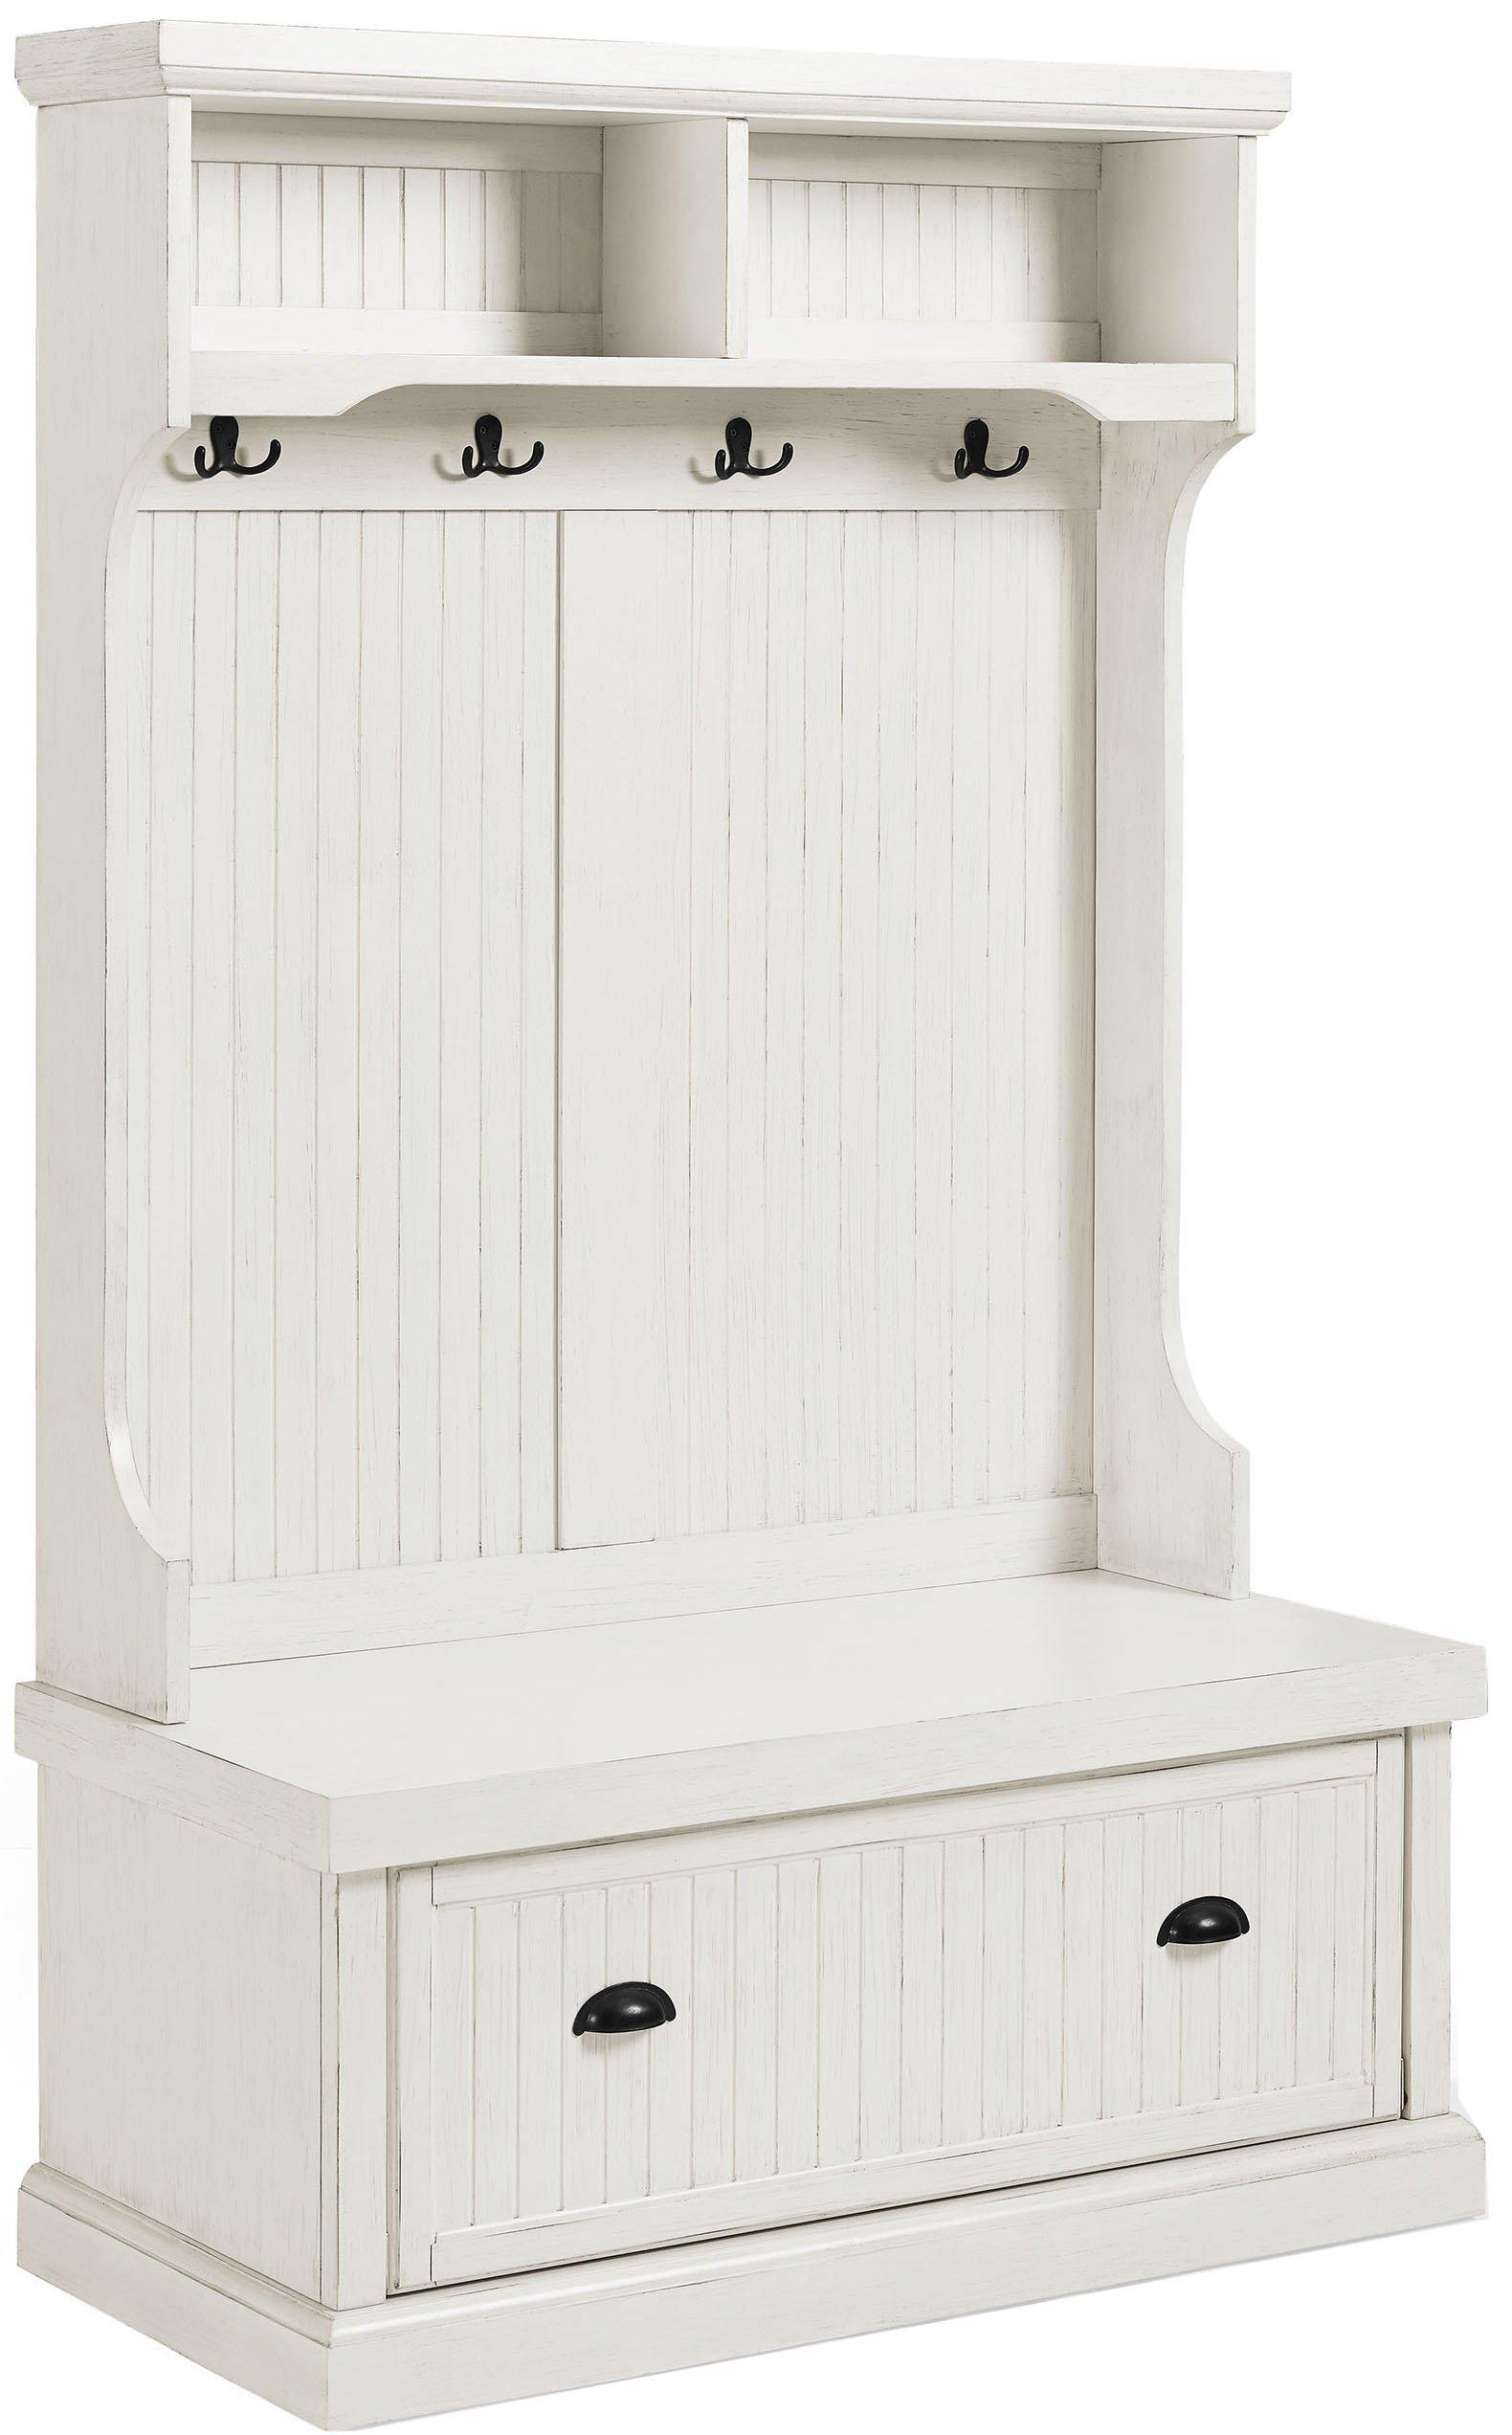 Crosley Furniture Seaside Hall Tree - Distressed White by Crosley Furniture